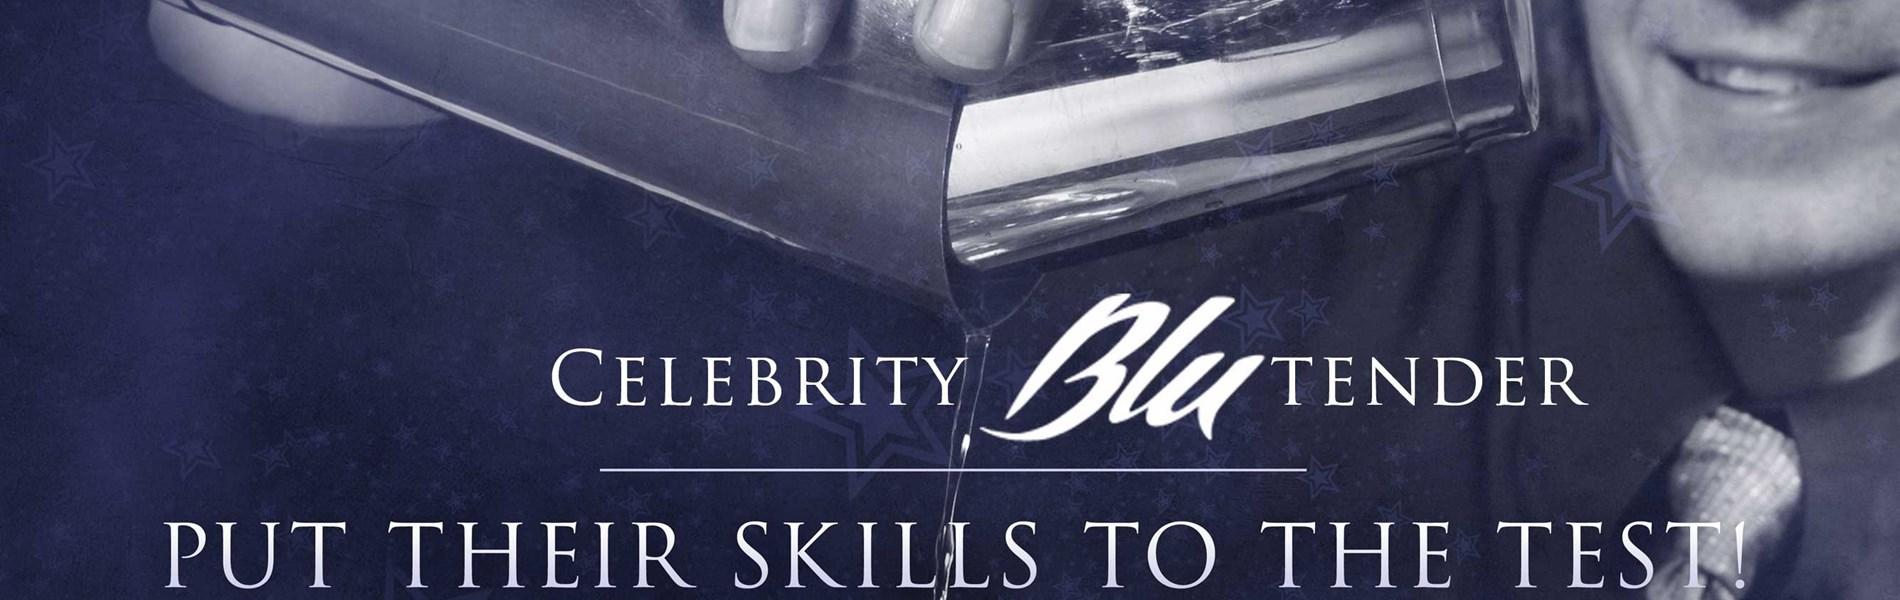 Celebrity BLUtender & BLUtender Battles at Blu